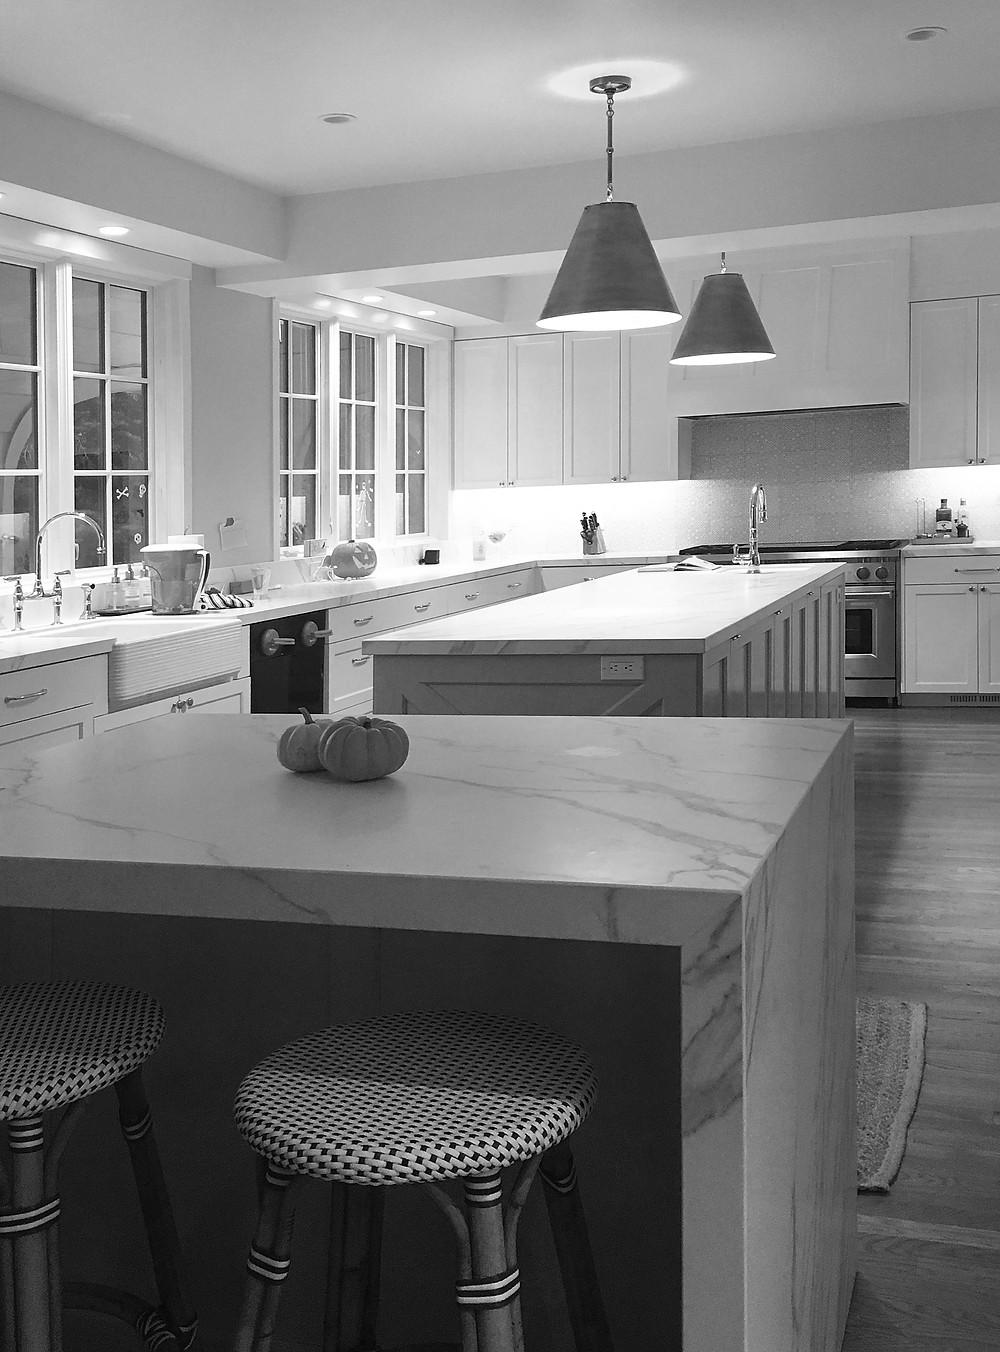 Reno Kitchen Remodel Overall.